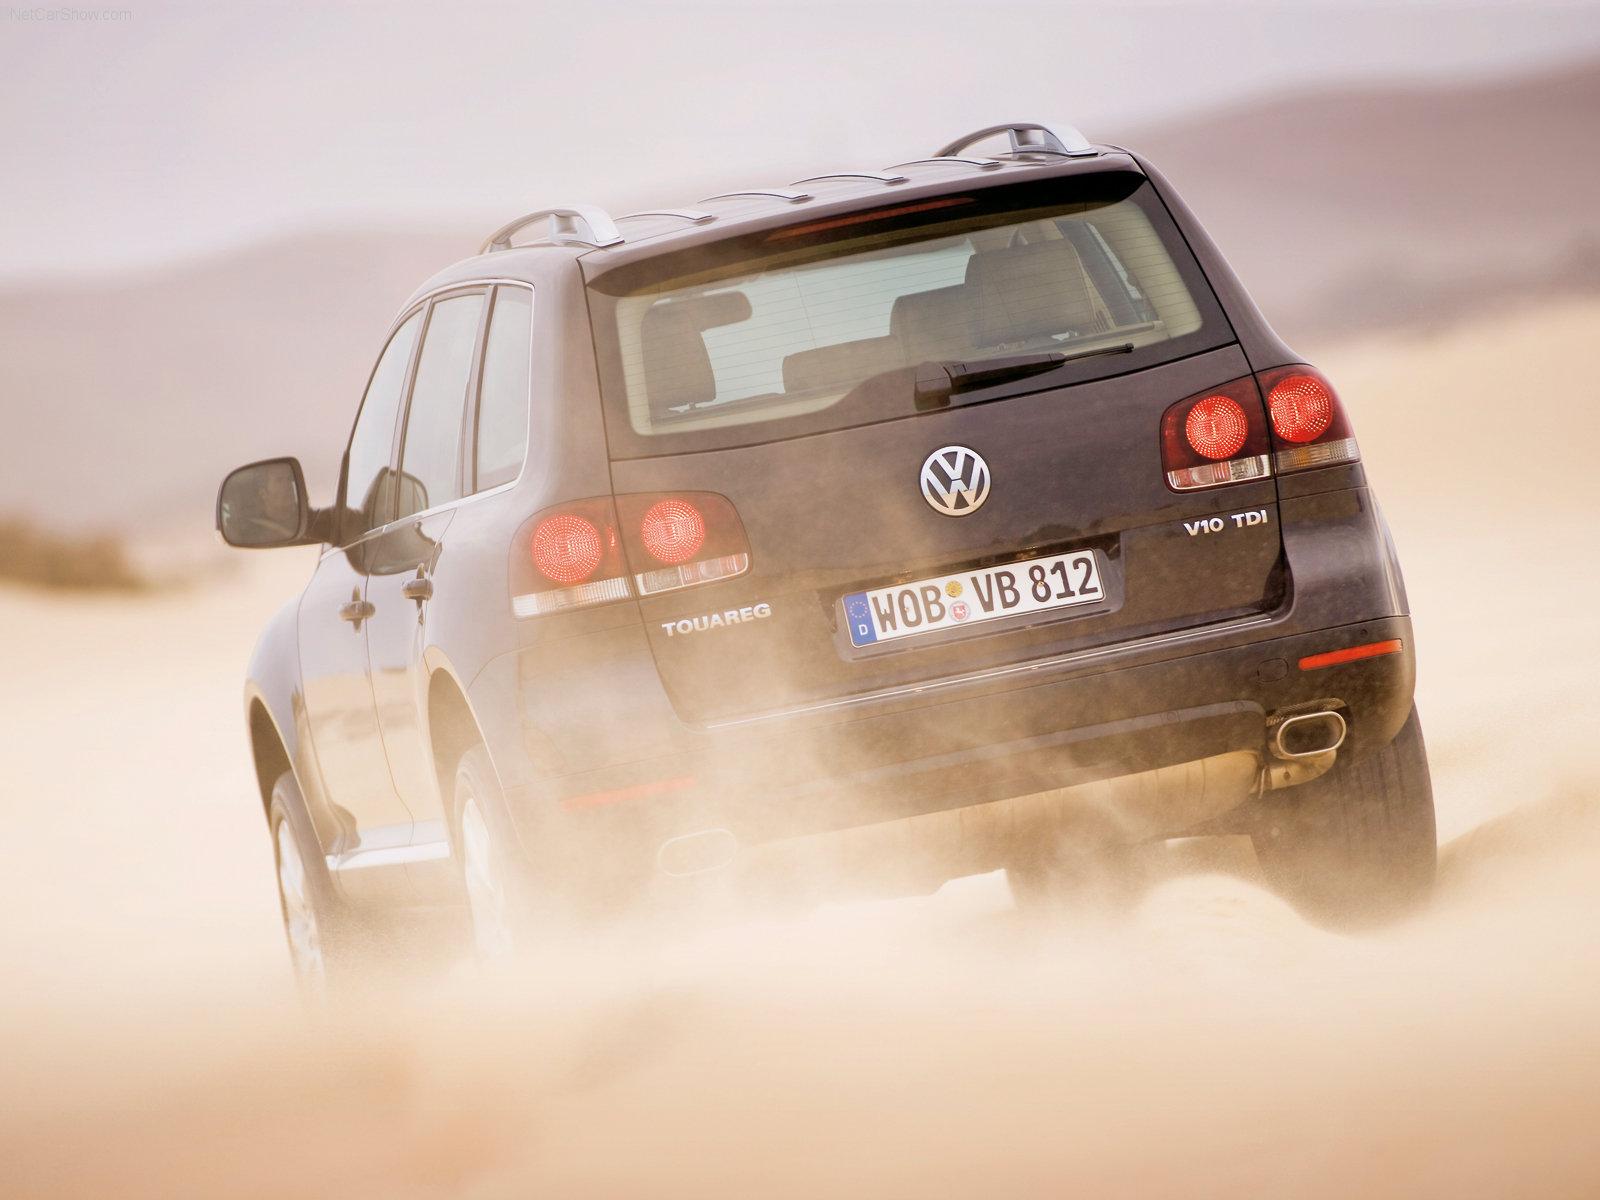 https://w04.ru/foto/Volkswagen-Touareg_2007_1600x1200_wallpaper_1b.jpg